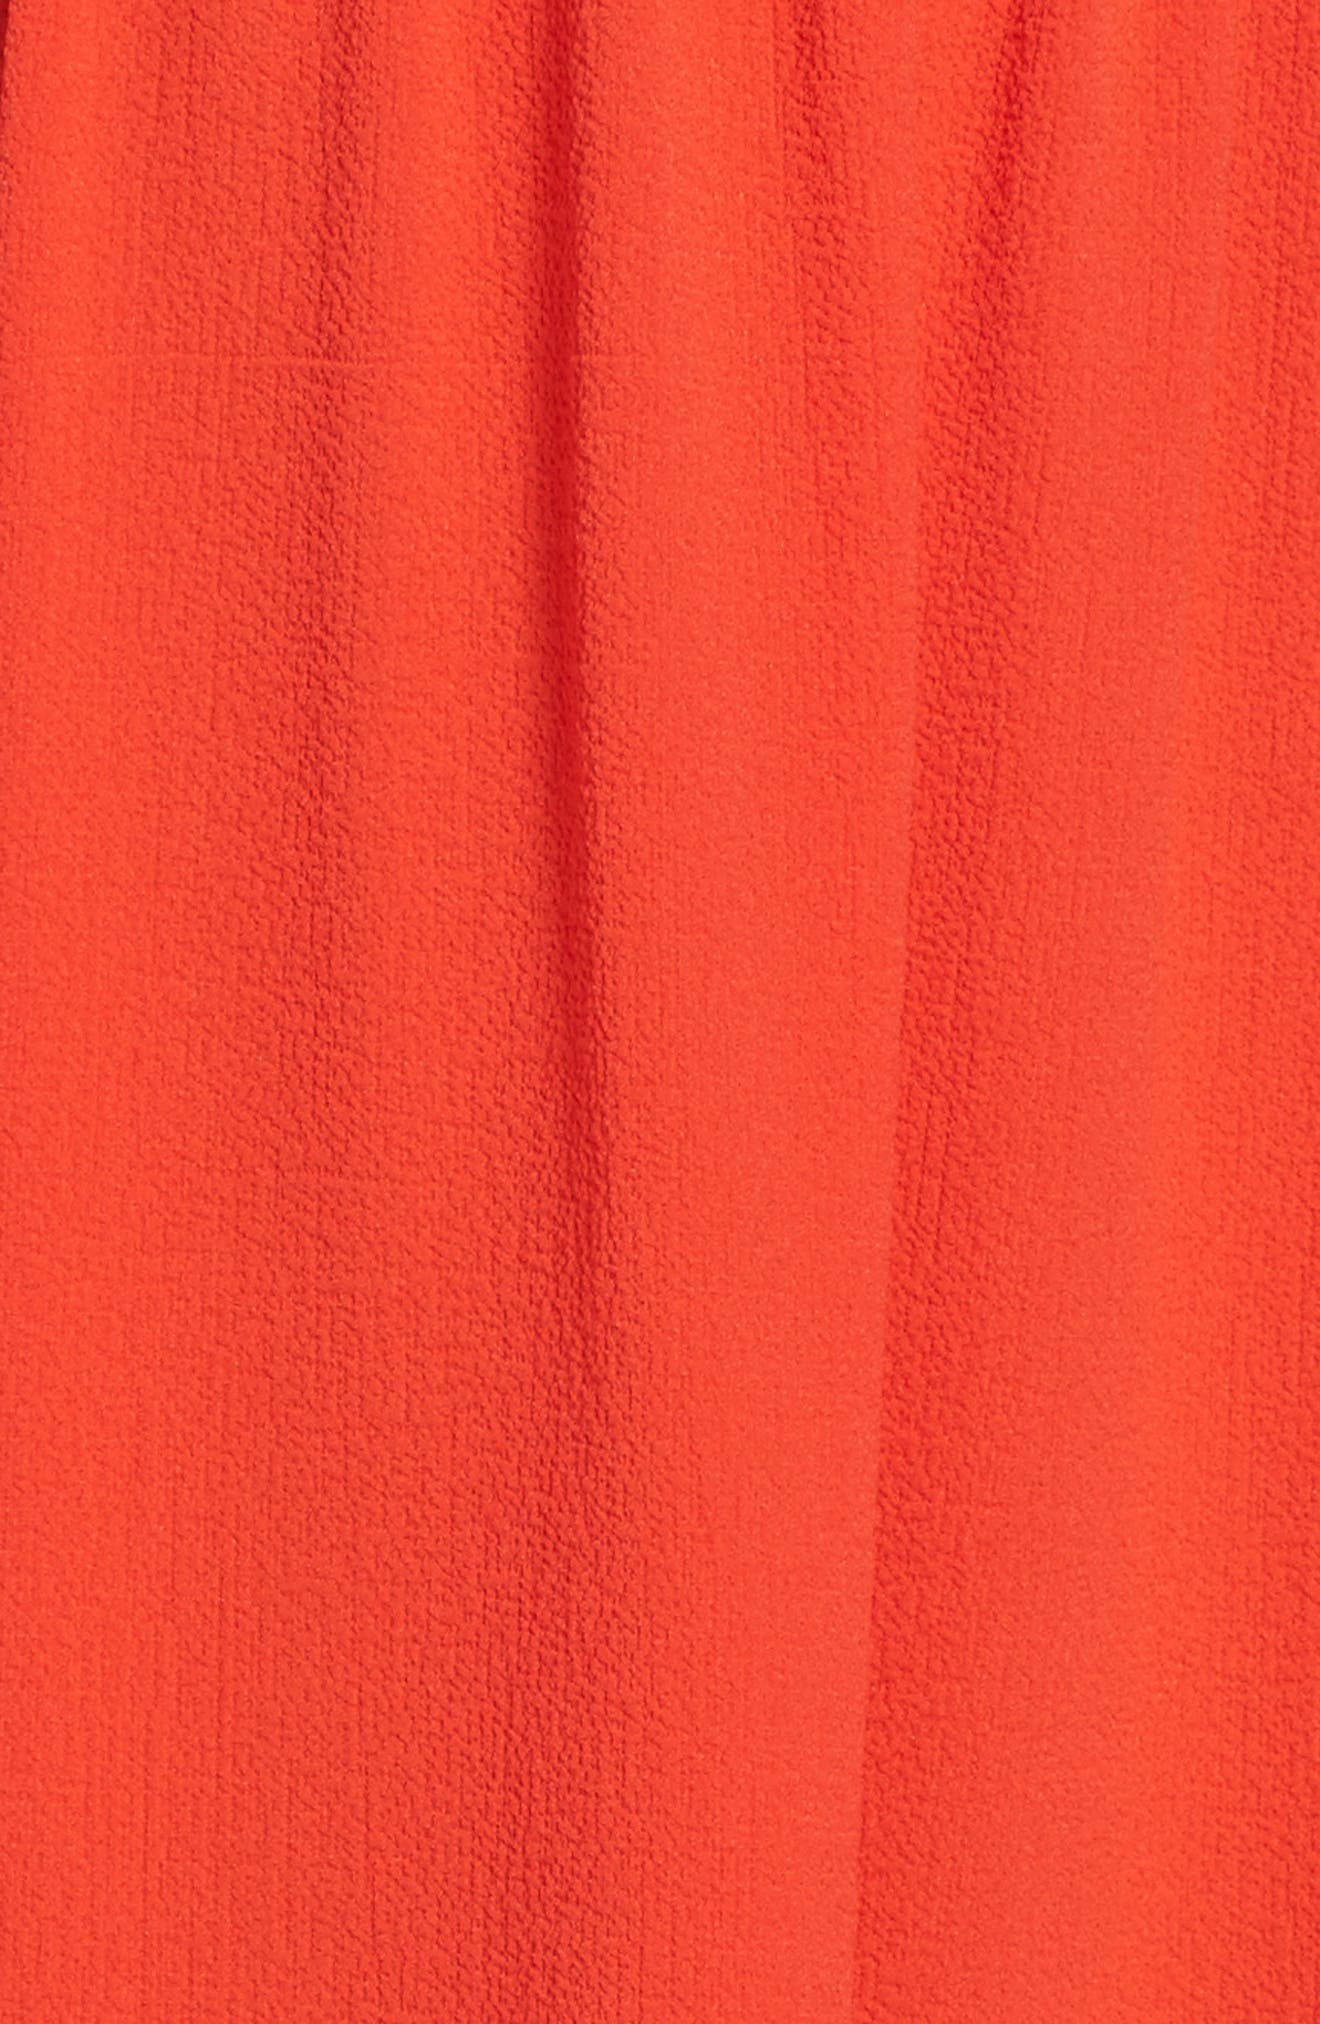 Off the Shoulder Crepe Dress,                             Alternate thumbnail 5, color,                             Poppy